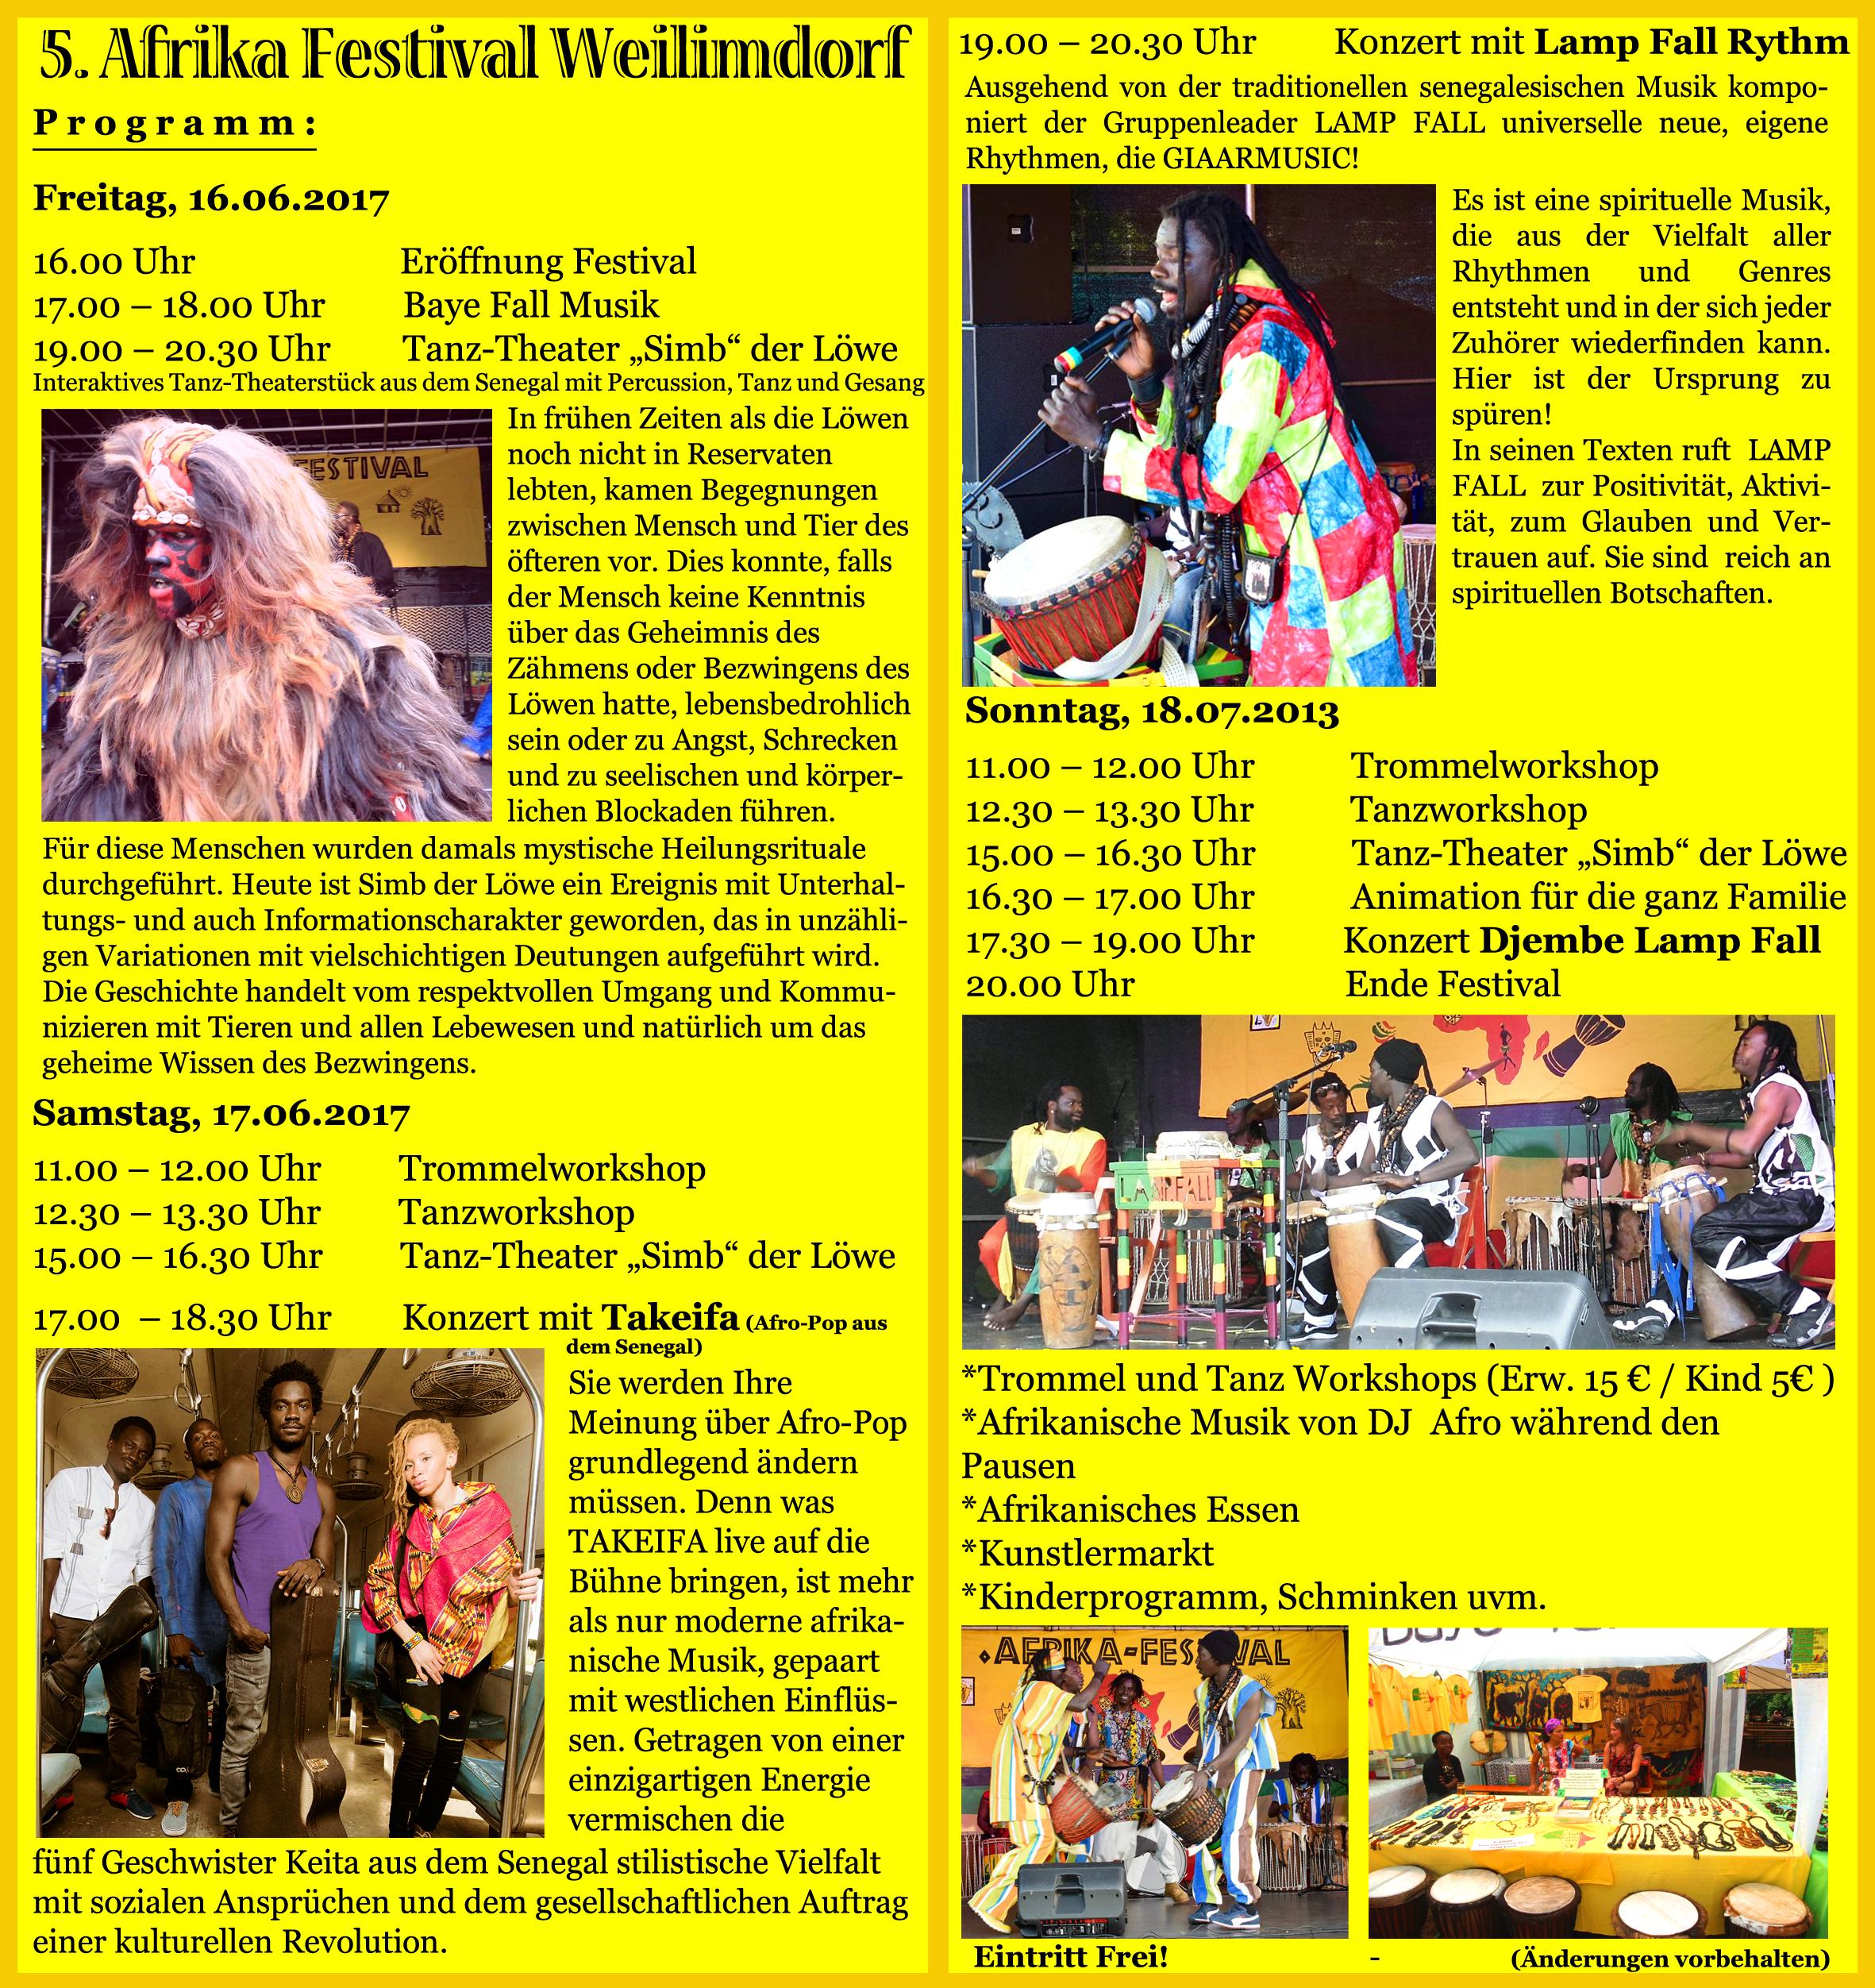 Flyer 5. Afrika Festival Weilimdorf 2017 innen